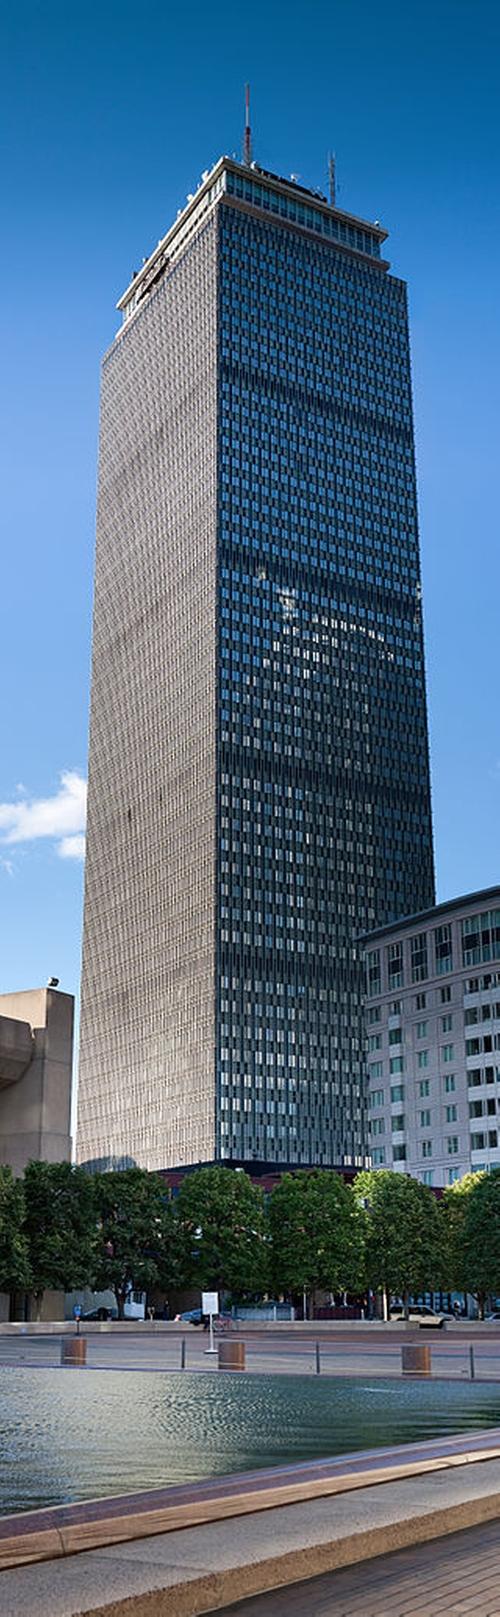 Prudential Tower Boston, Massachusetts in Black Mass